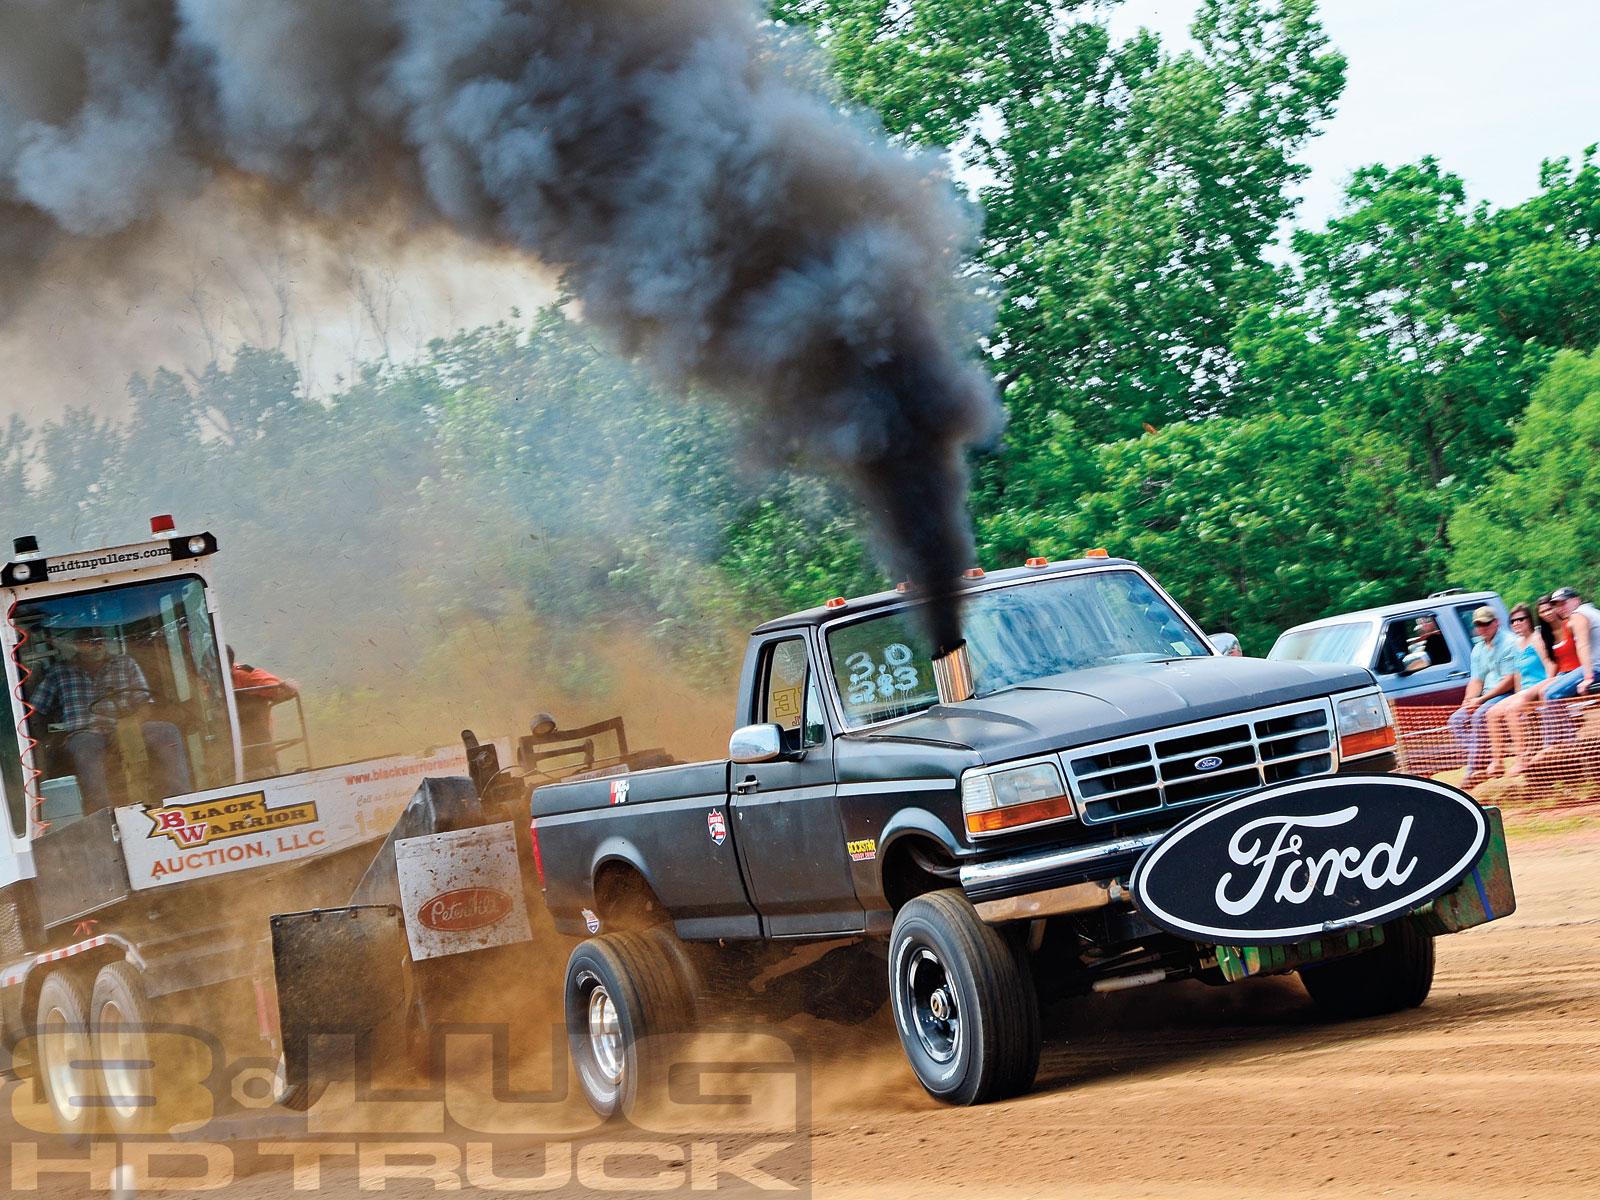 47+] Ford Truck Wallpaper Desktop on